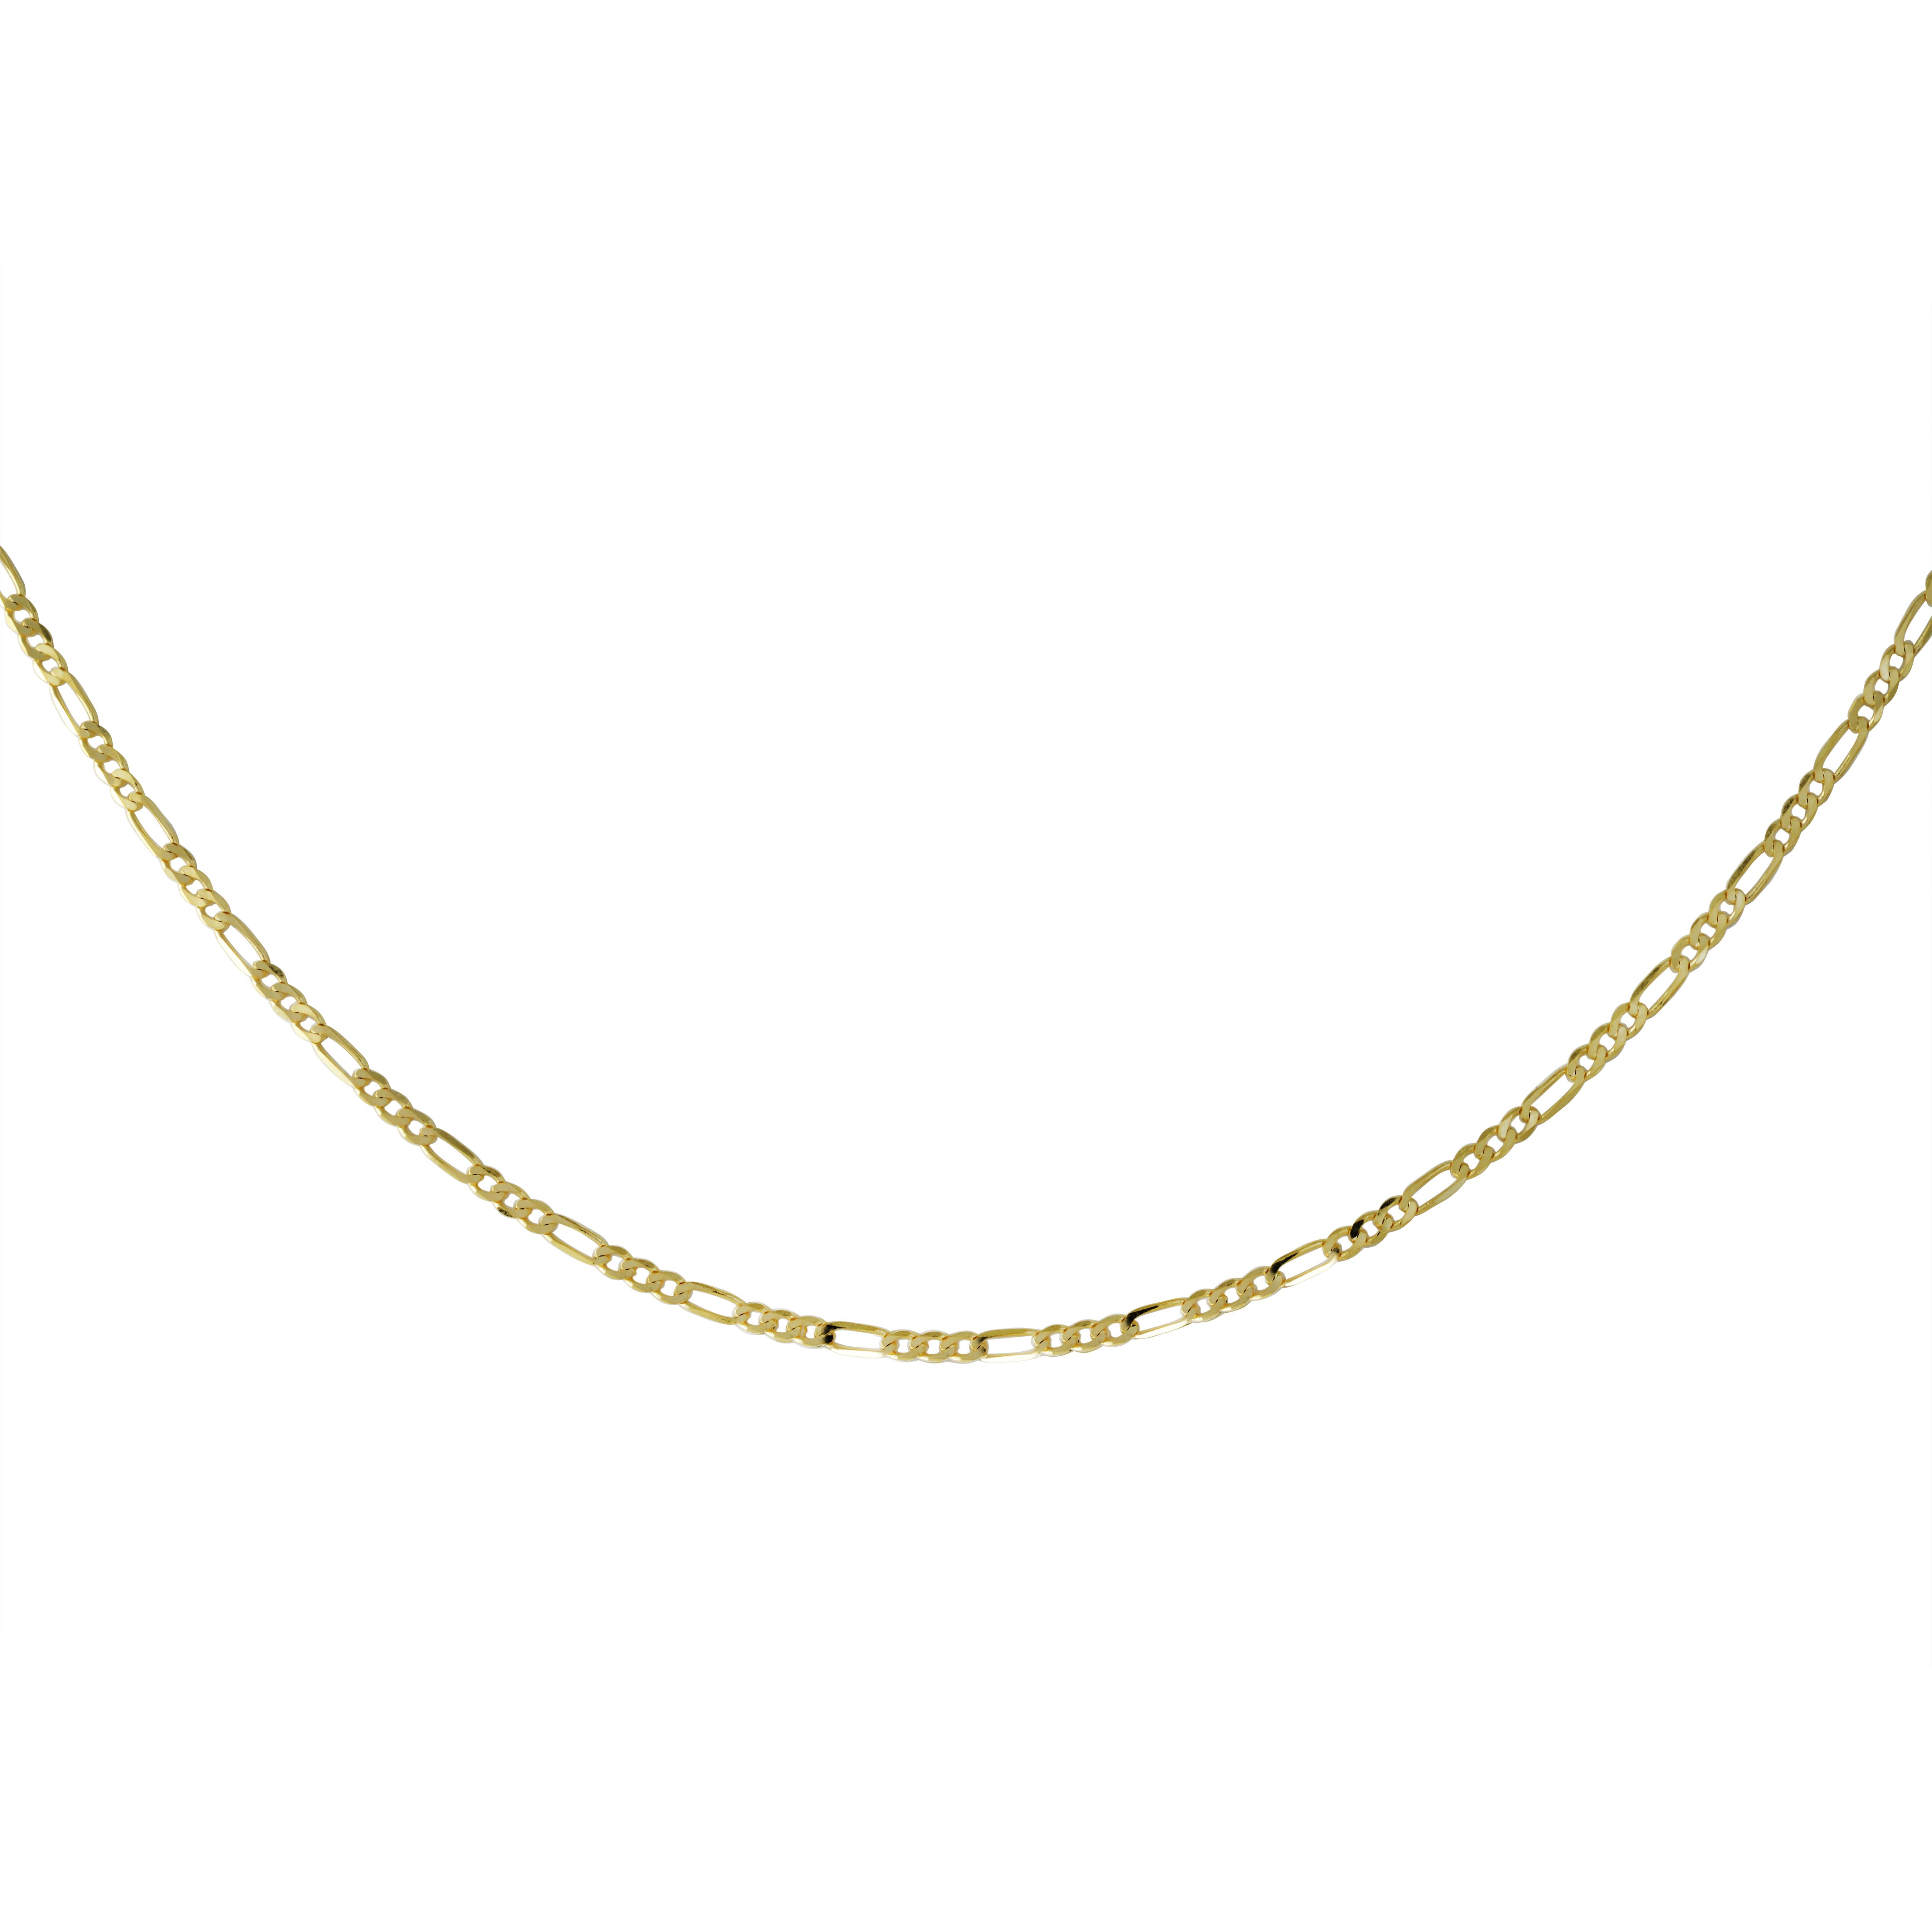 Chaîne 18'' figaro pour femme - Or jaune 10K